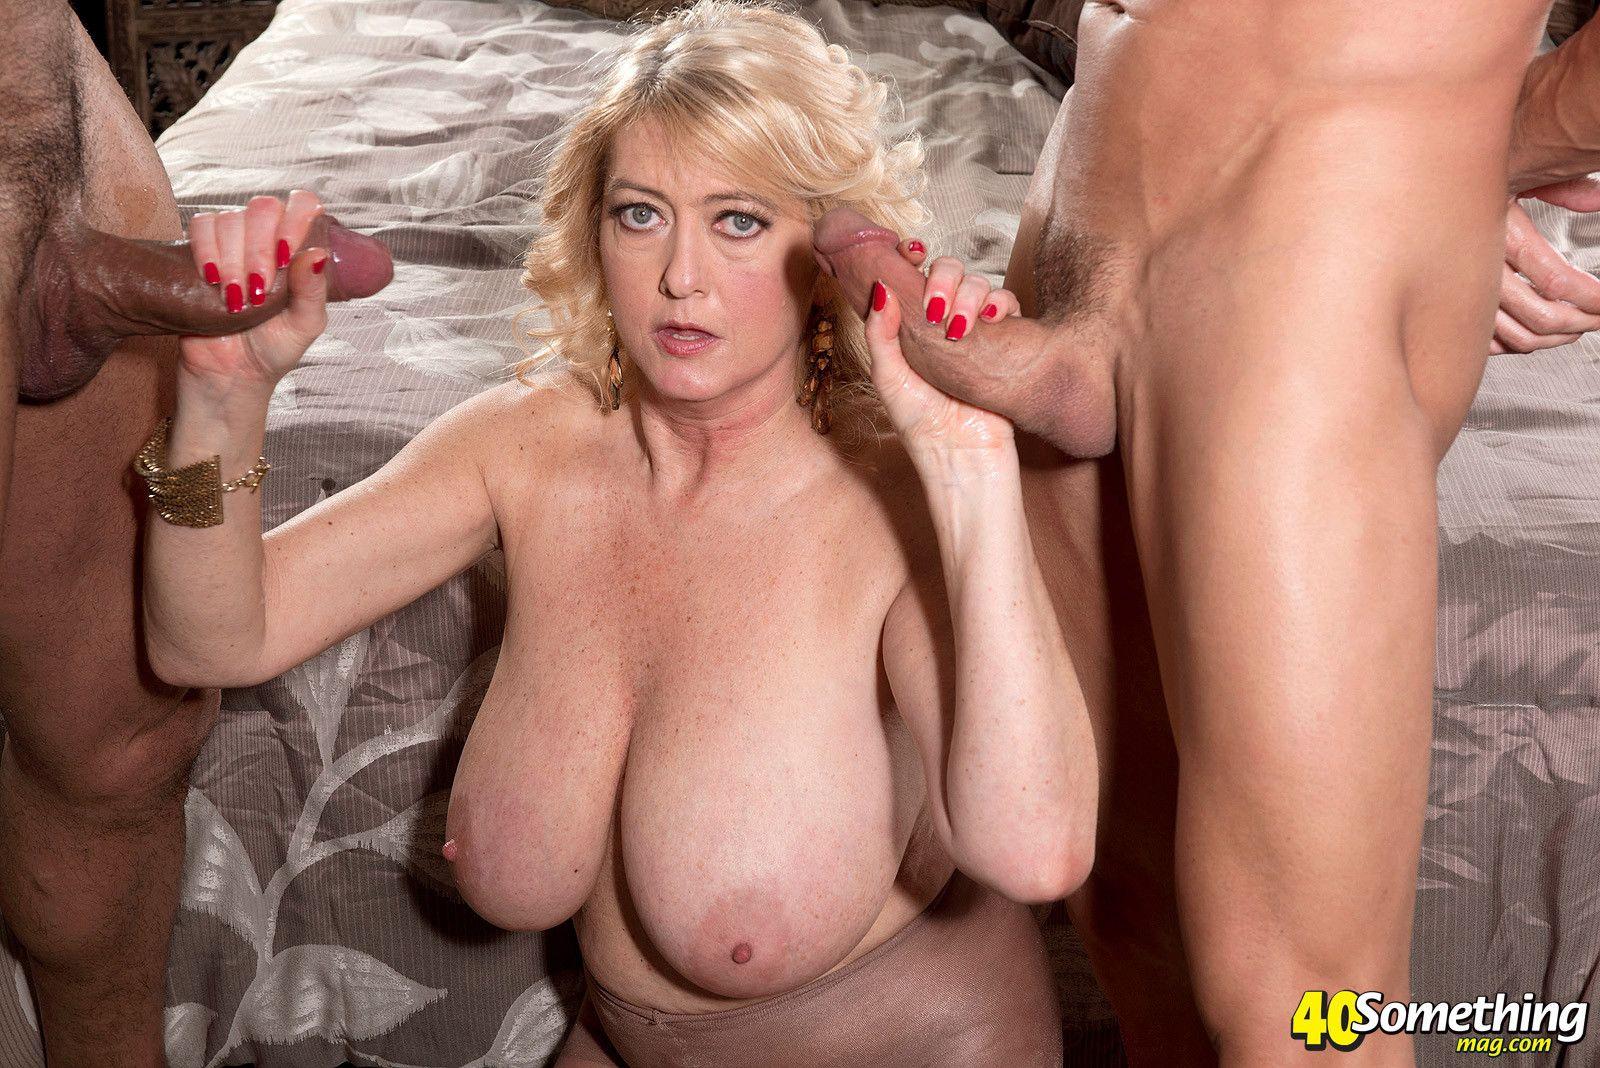 Mini Blonde Butt Fucked Involving Naughty Threesome